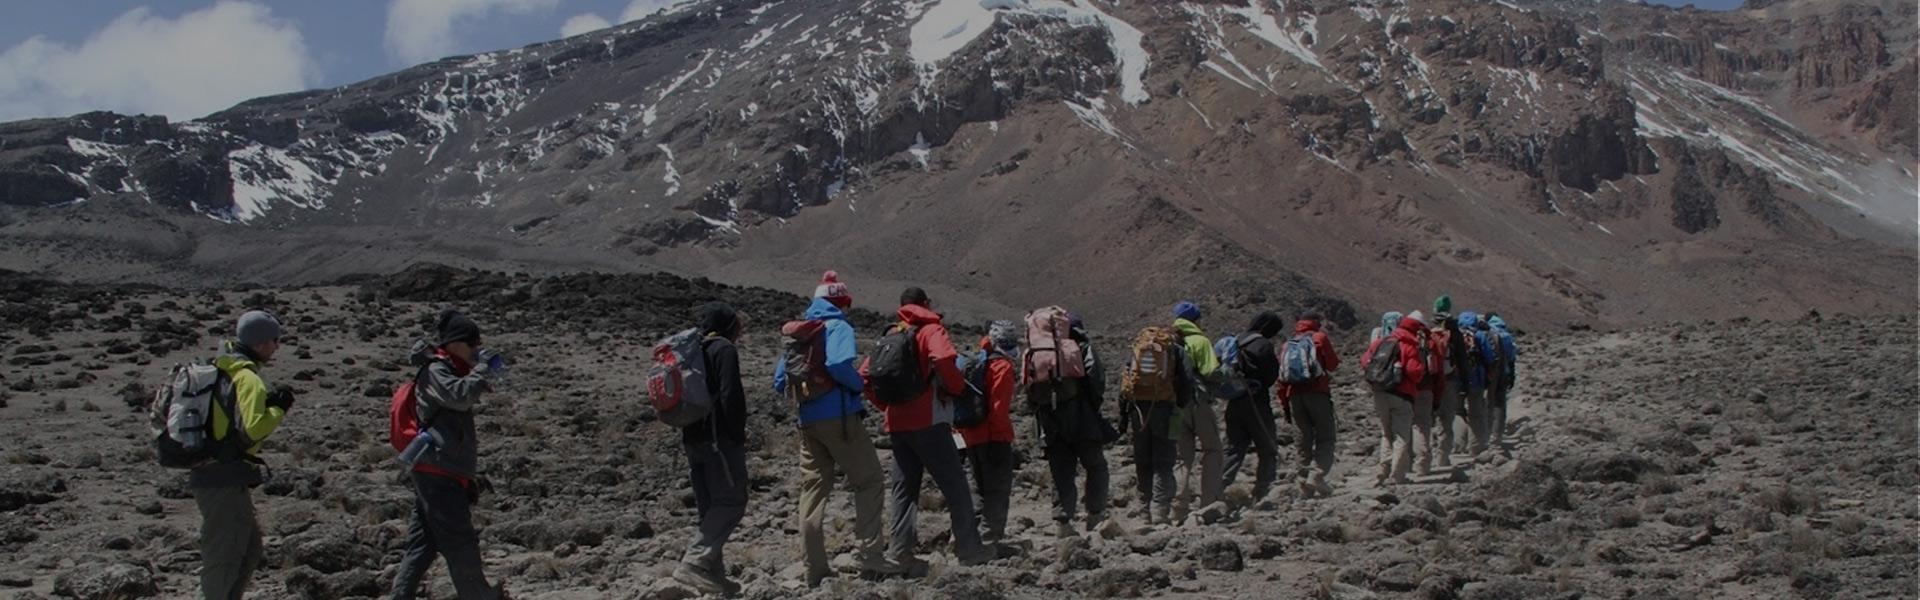 Daypack on Kilimanjaro